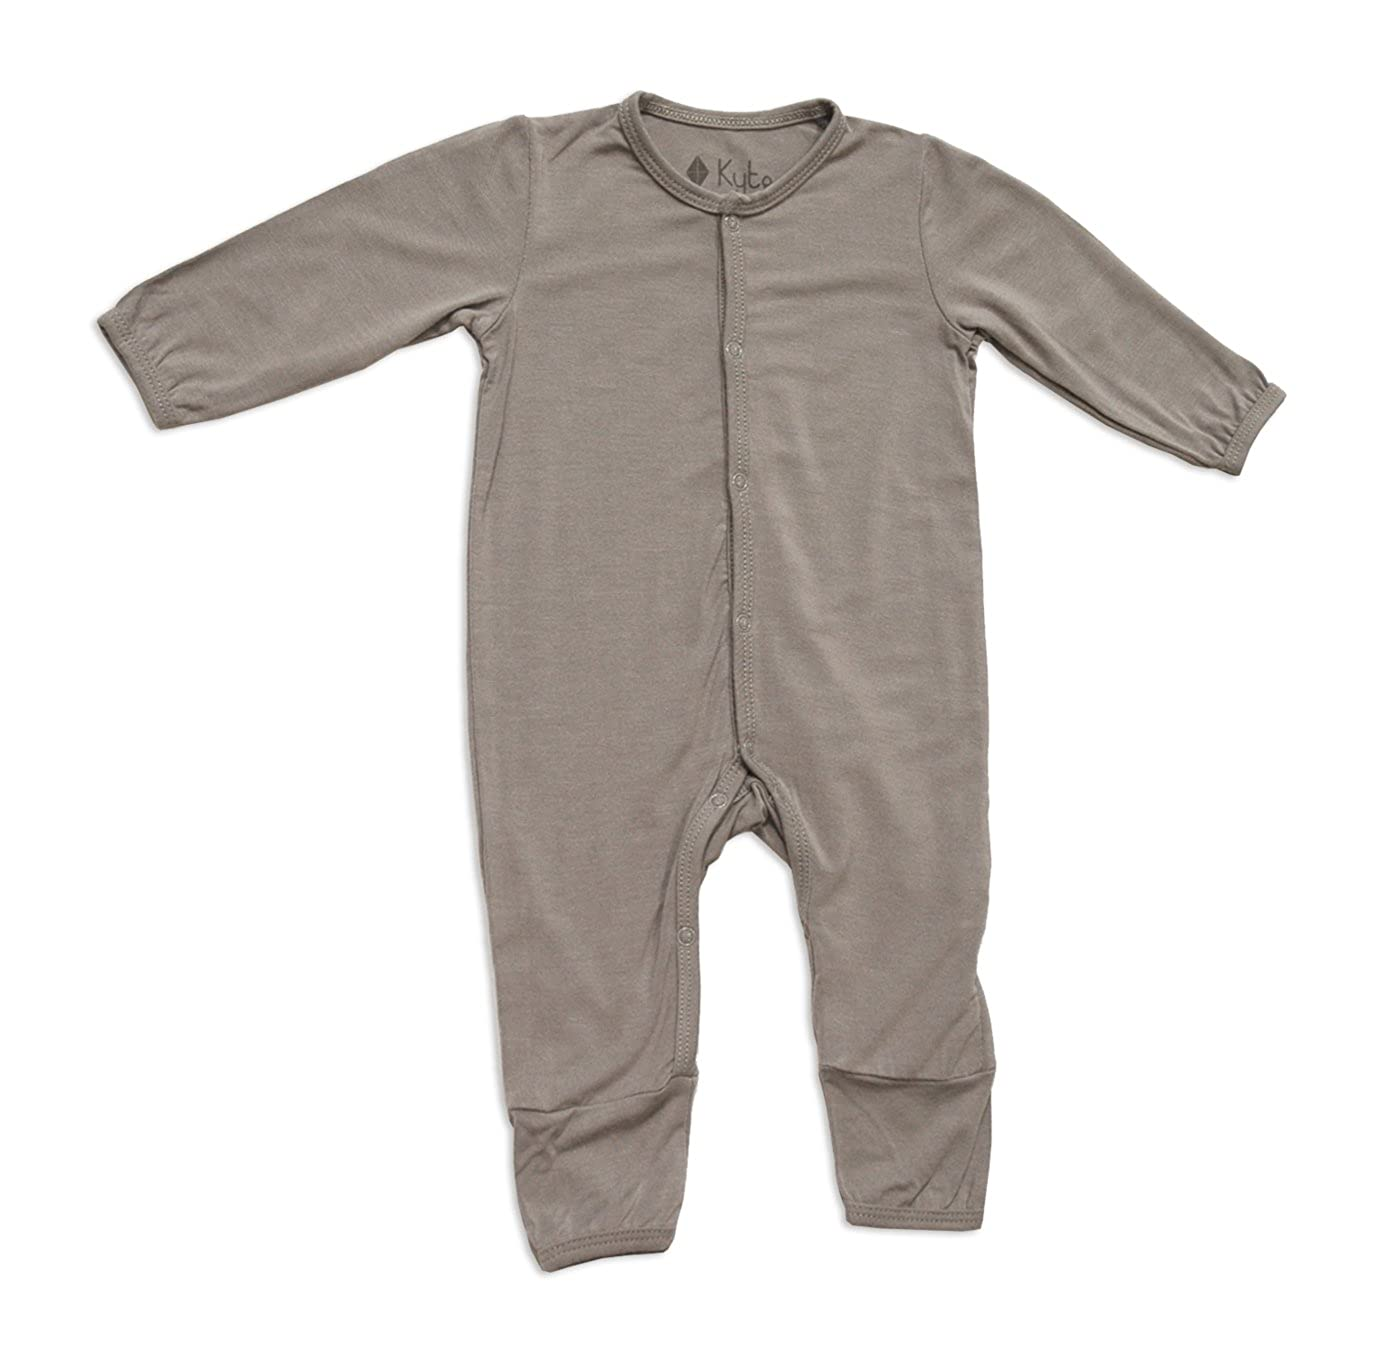 Kyte Newborn BABY B06XP37KK8 SHIRT ユニセックスベビー B06XP37KK8 クレイ Newborn クレイ Newborn|クレイ, 開運HAPPY雑貨のお店 BIGTOWER:1f07d19f --- itxassou.fr